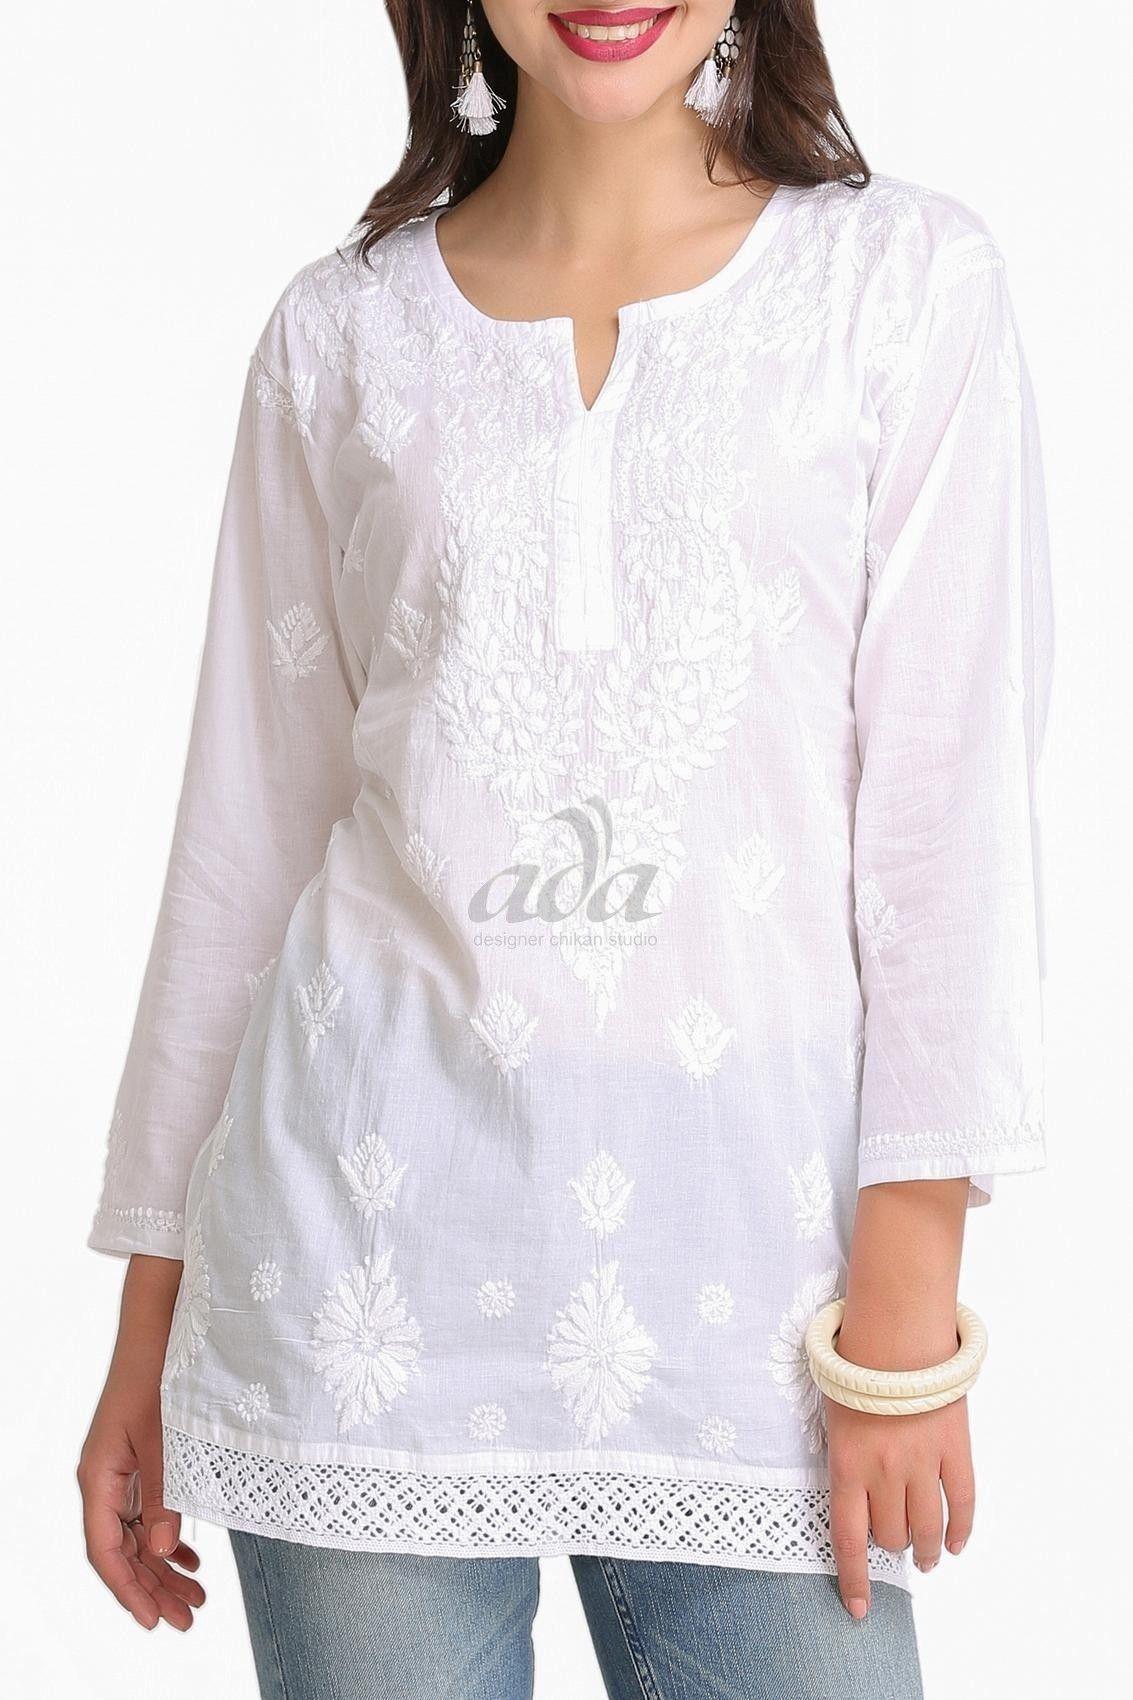 c3272044dd Ada Hand Embroidered White Cotton Lucknow Chikankari Top- A208704 Price  Rs.790.00 #Ada_Chikan #chikankari online store #white lakhnavi kurti online  #buy ...